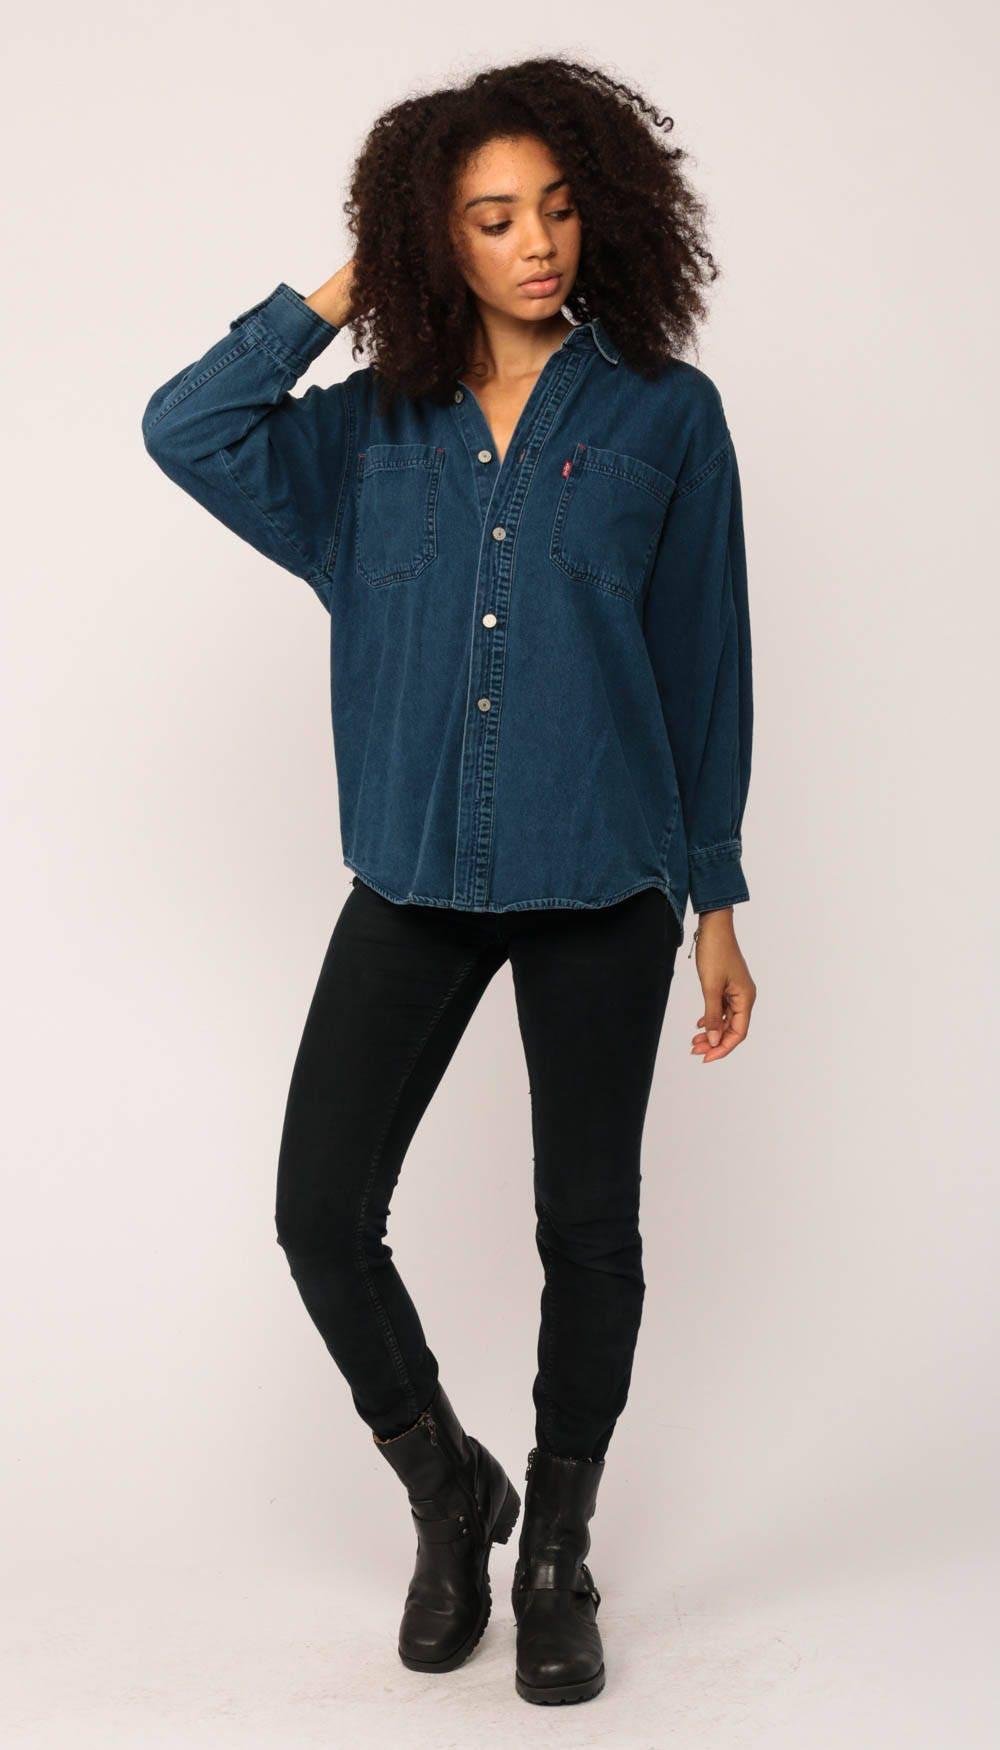 levis denim shirt grunge button down 90s levi jean blue long. Black Bedroom Furniture Sets. Home Design Ideas